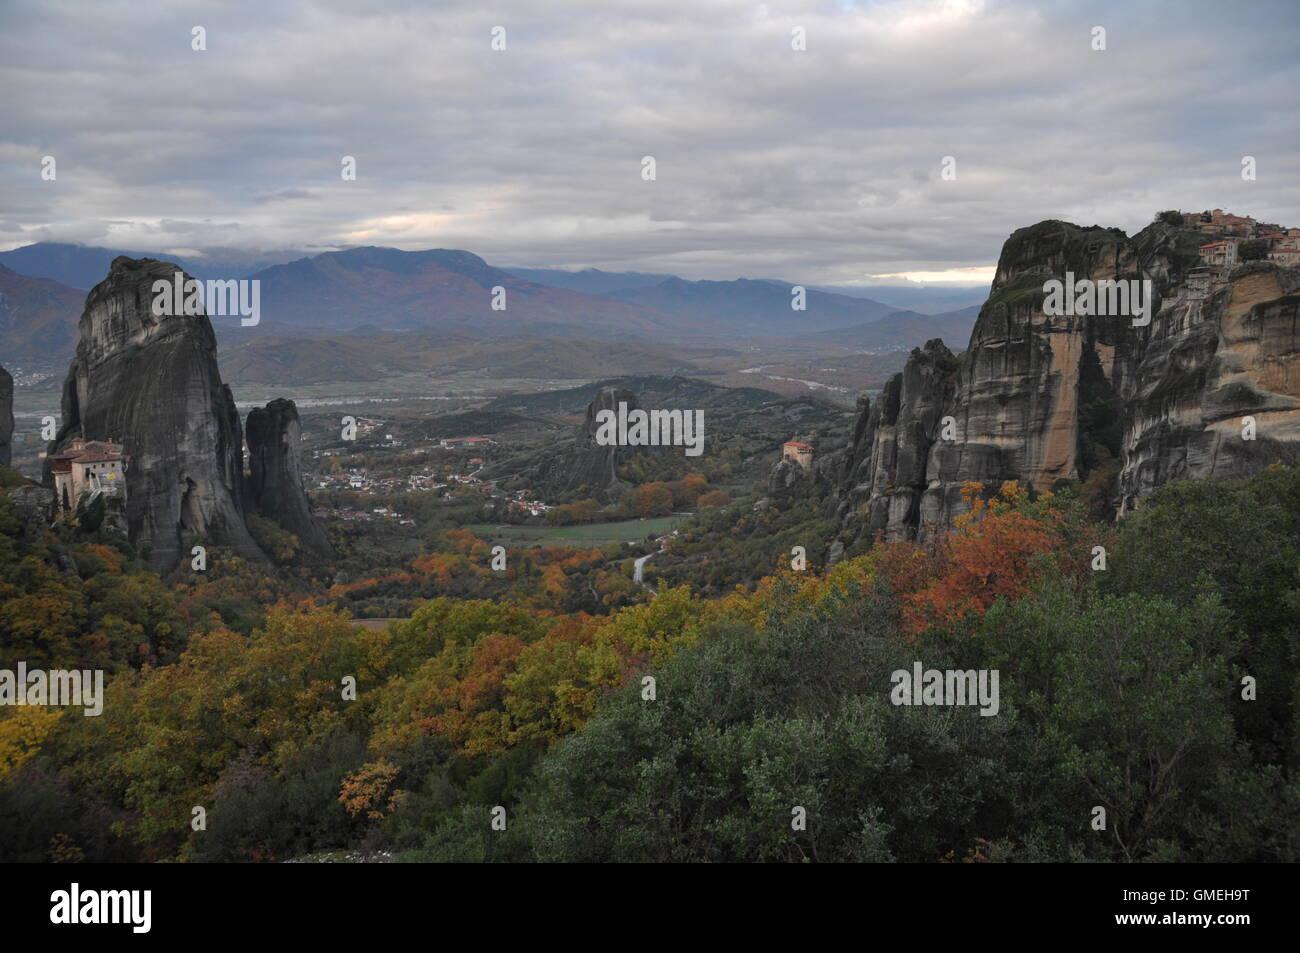 Meteora Rocks and Monasteries, Greece - Stock Image